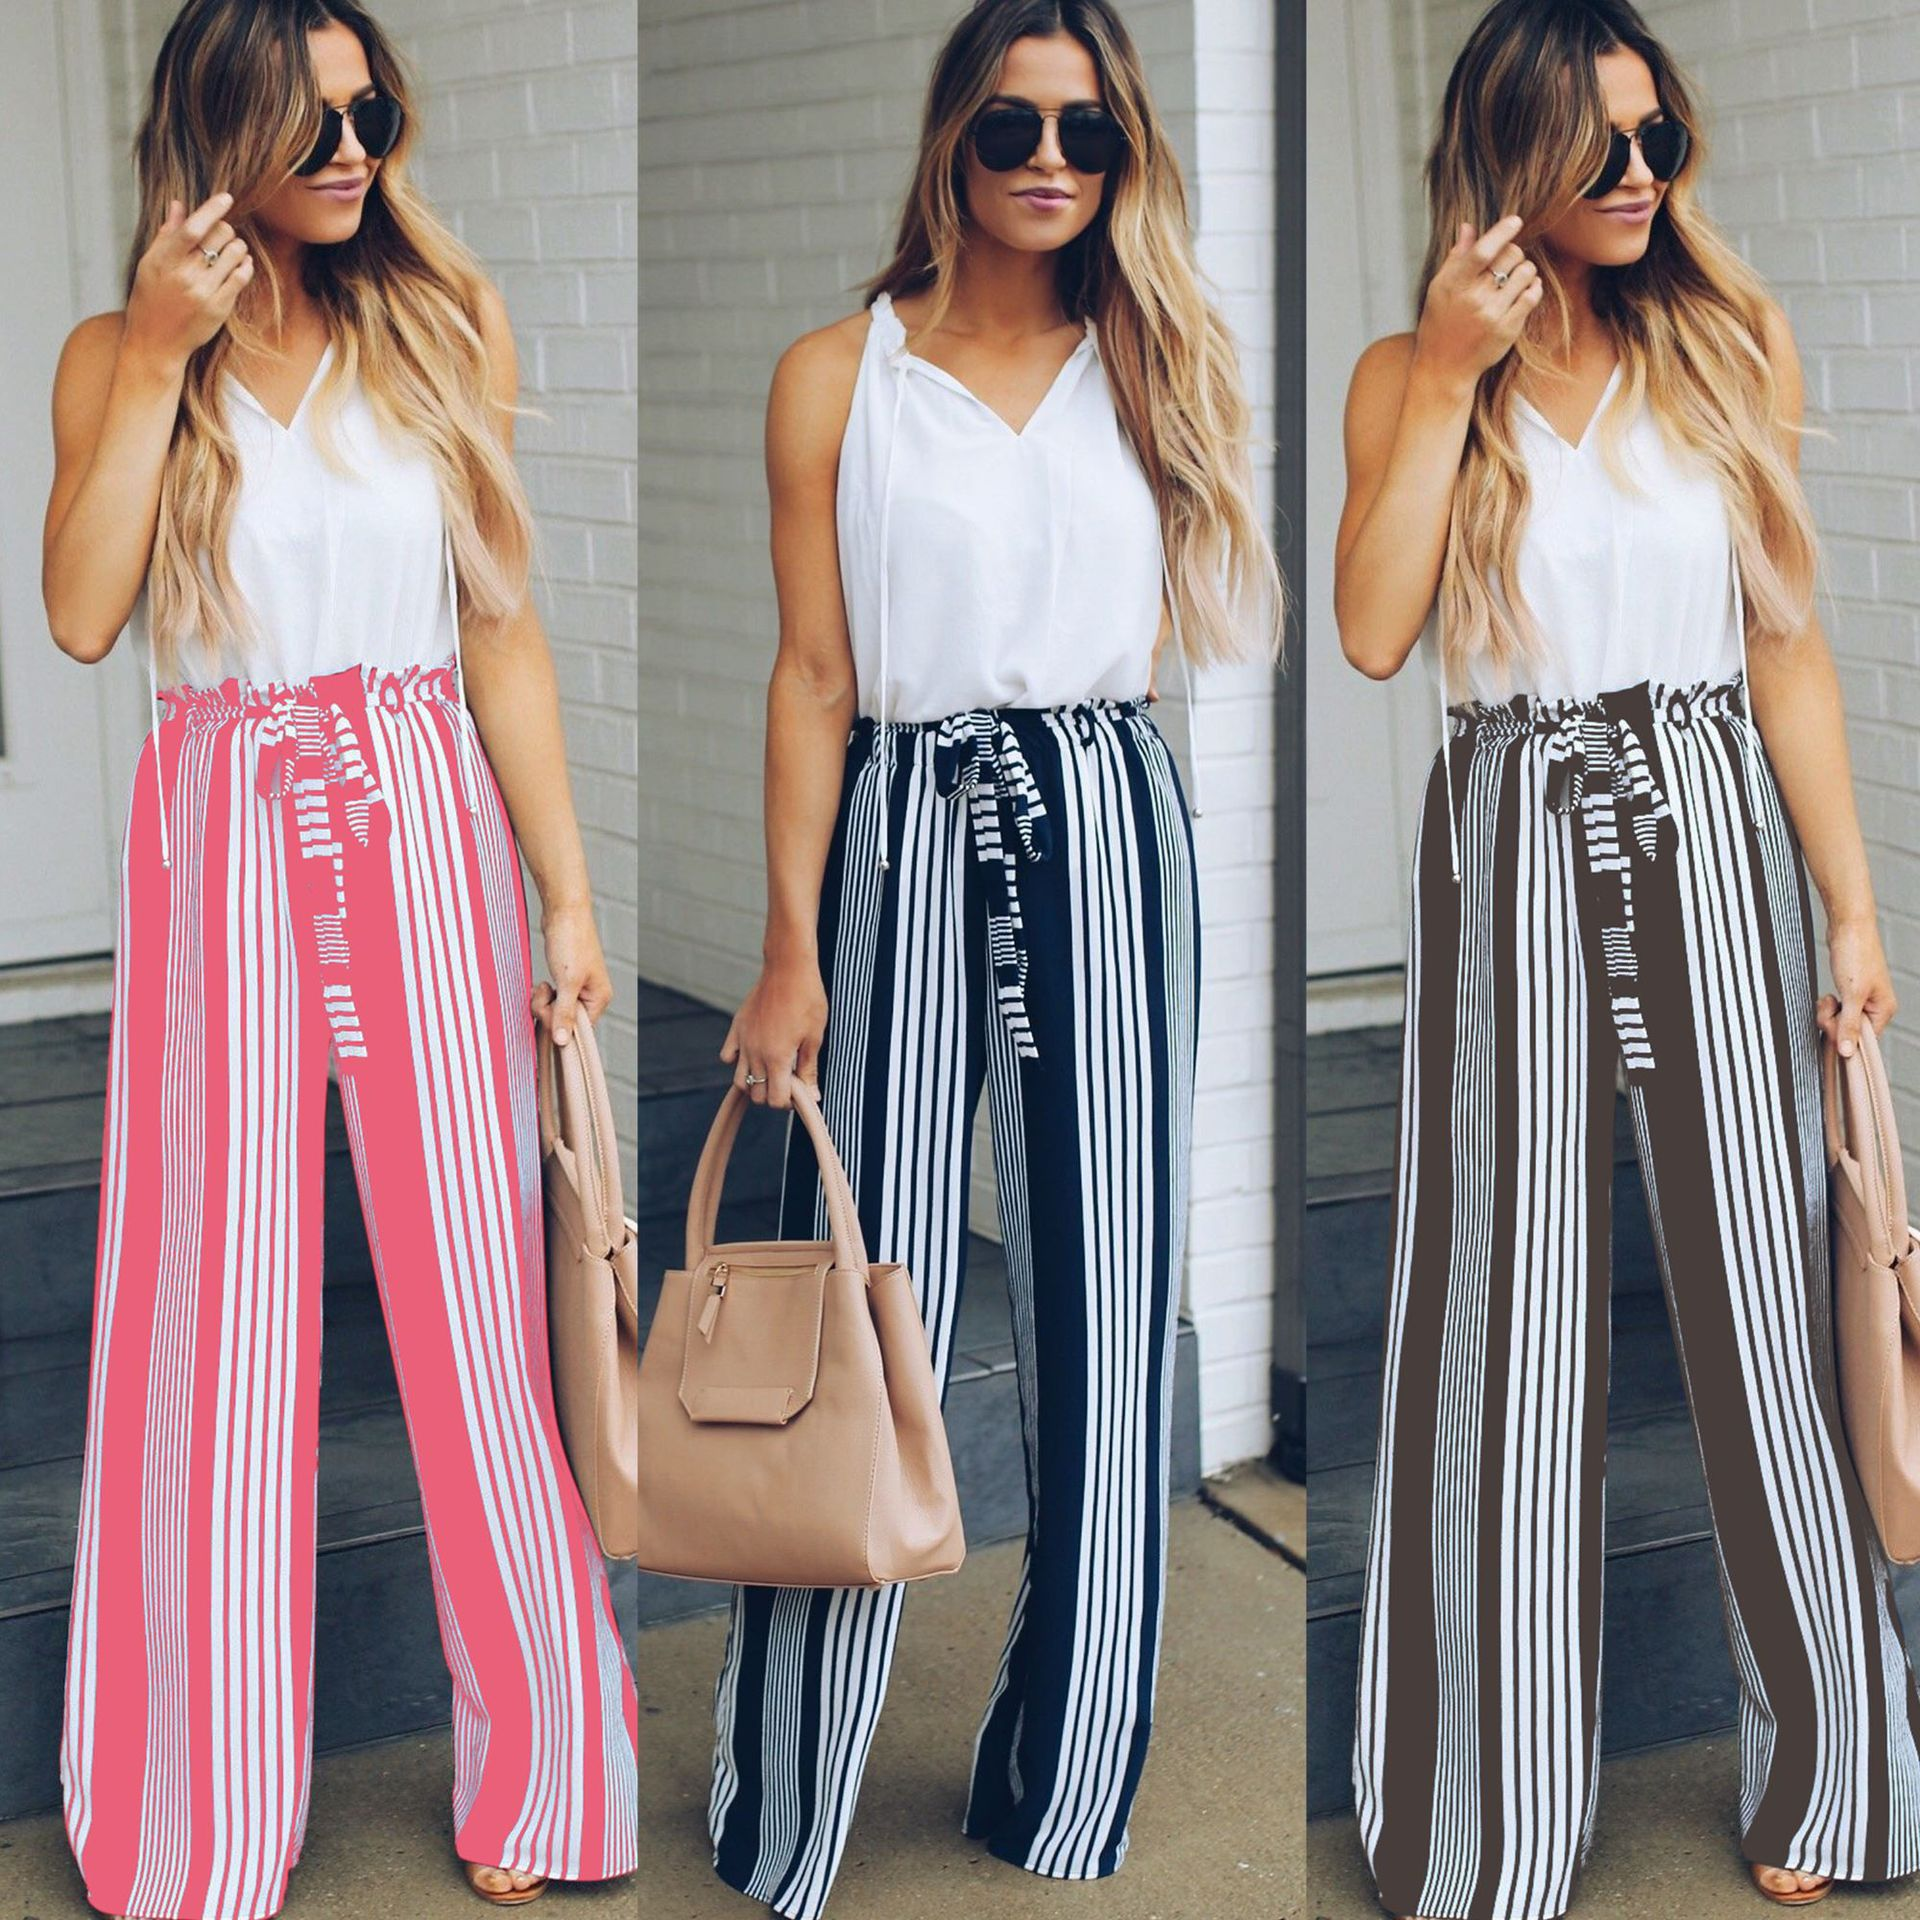 2018 Hot Sale Women Stripe Printed Bandage   Wide     Leg     Pants   Casual   Leg     Pants   For Women Lace Up Trousers Women Casual   Pants